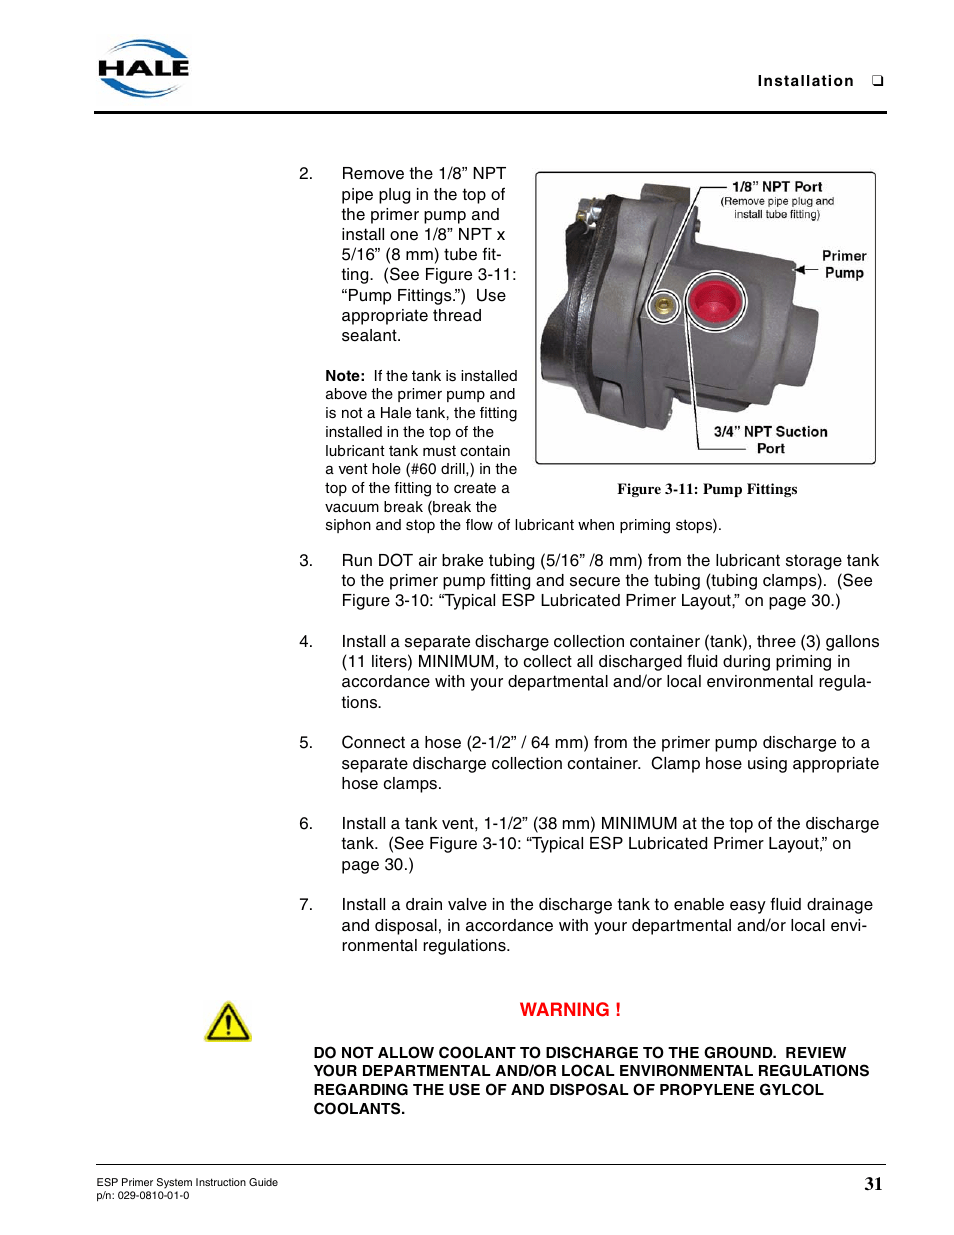 hight resolution of figure 3 11 pump fittings hale esp priming system user manualfigure 3 11 pump fittings hale